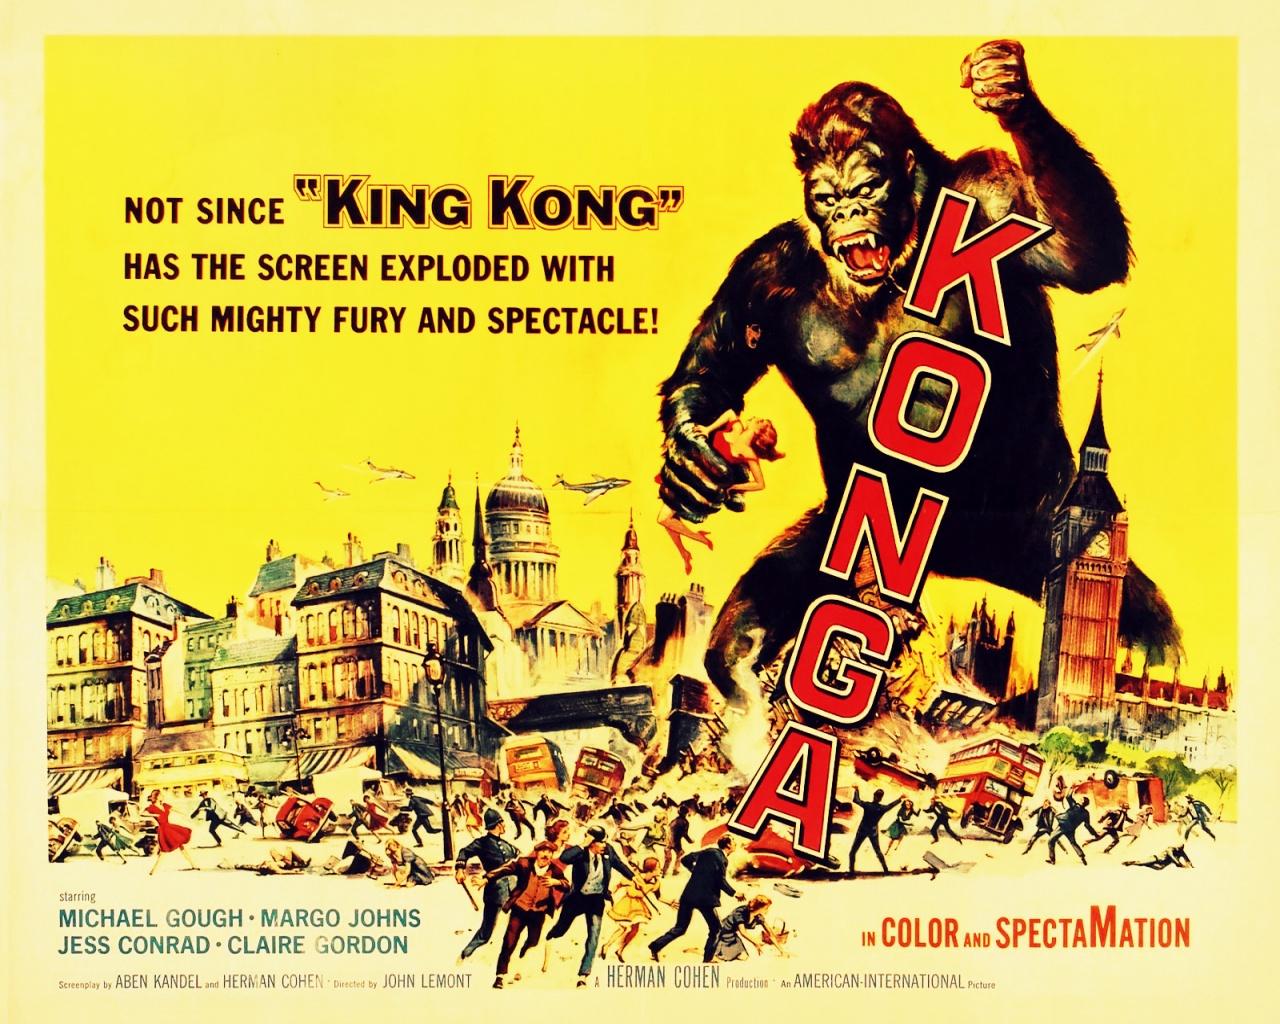 1280x1024 Vintage Cinema Konga desktop PC and Mac wallpaper 1280x1024